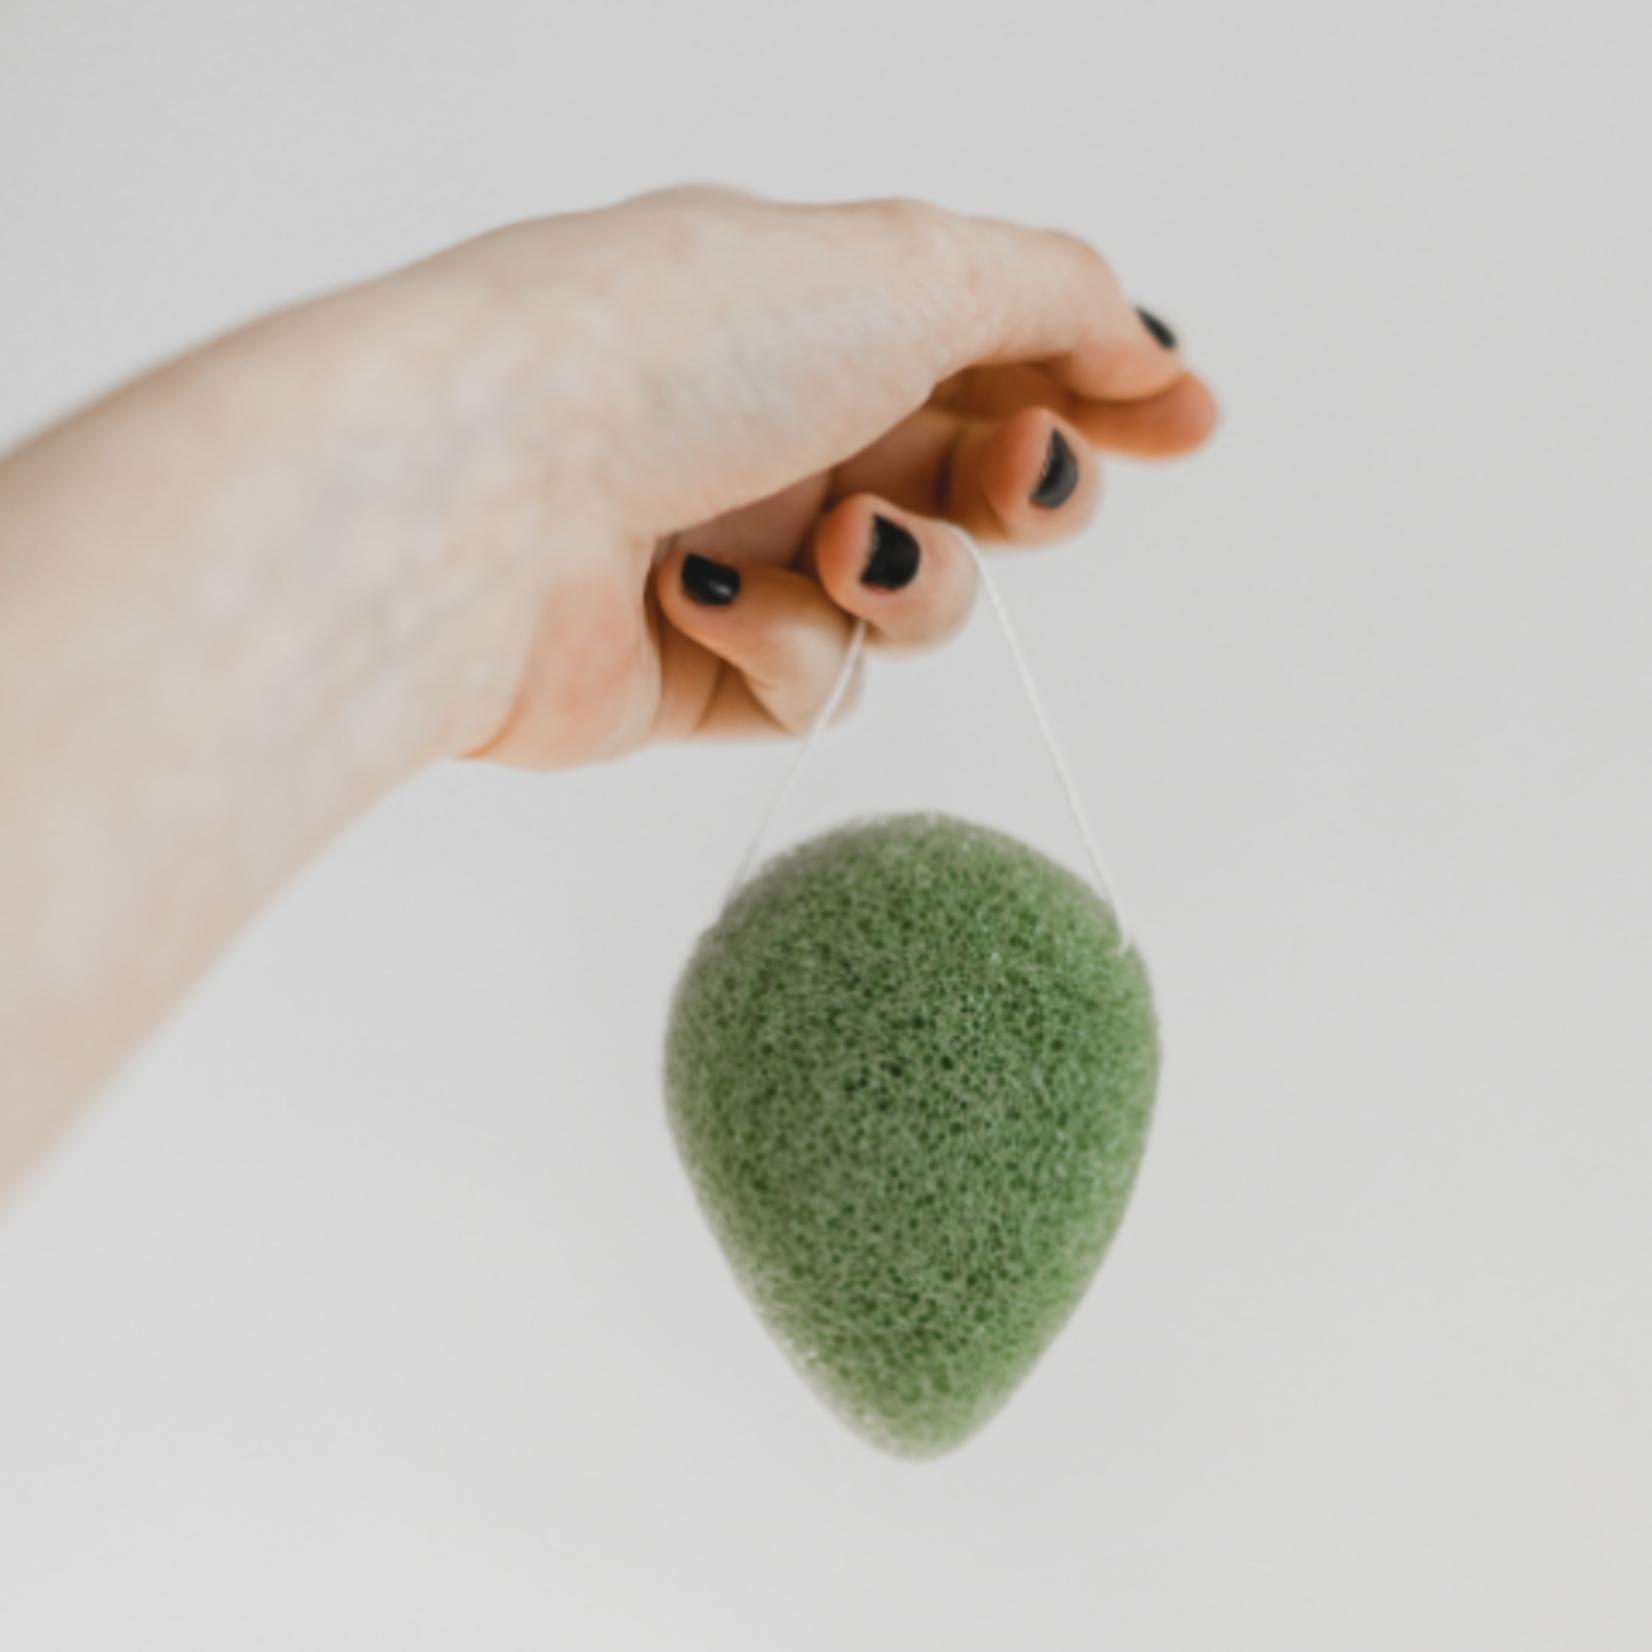 BKIND Konjac Facial Sponge - Green Clay